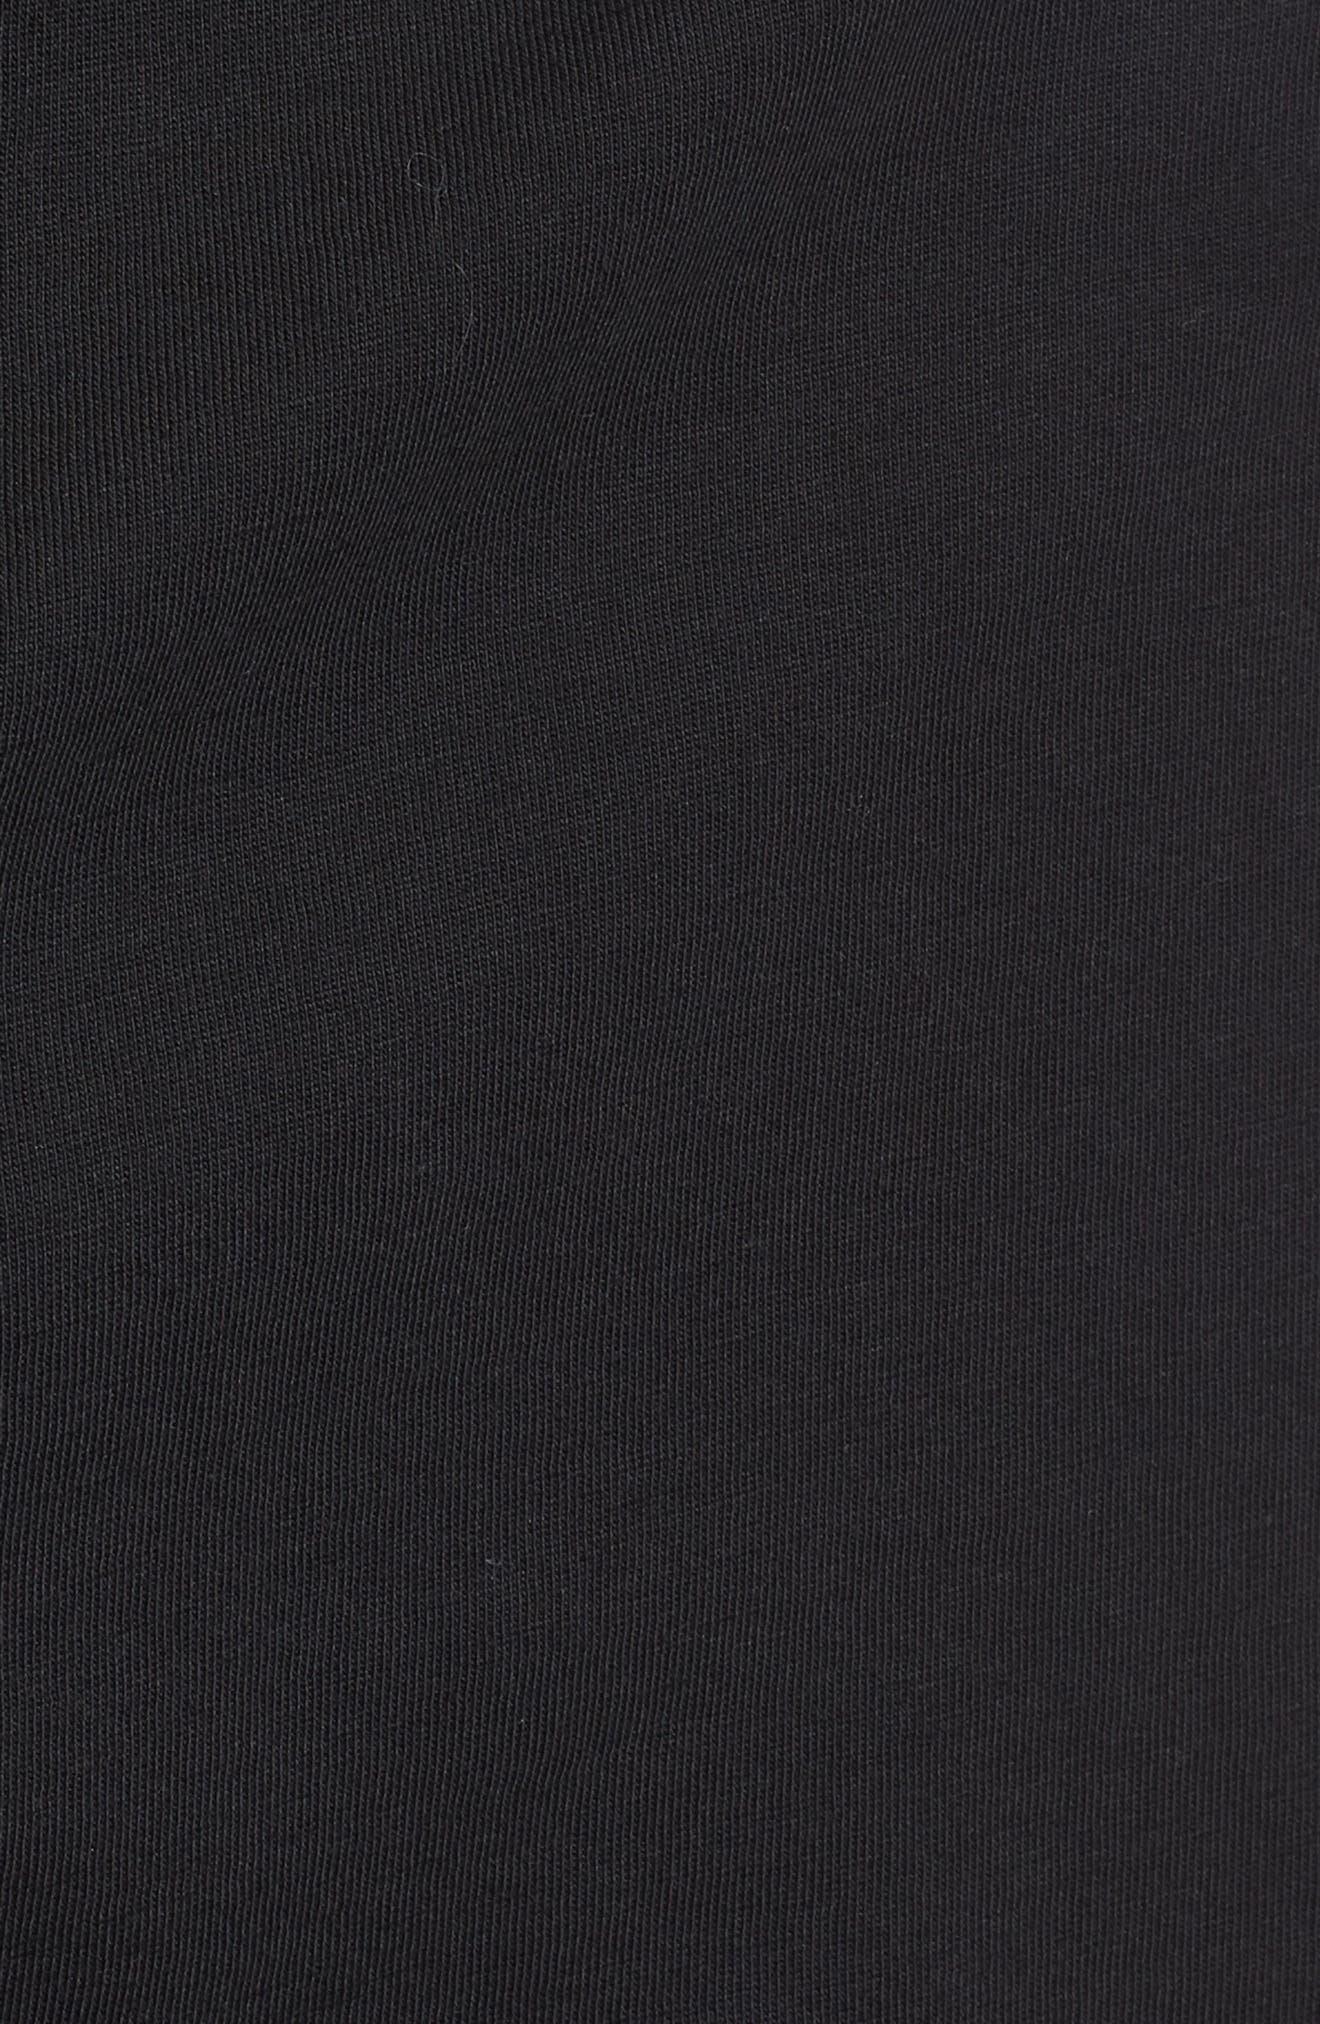 3-Pack Knit Boxers,                             Alternate thumbnail 6, color,                             001